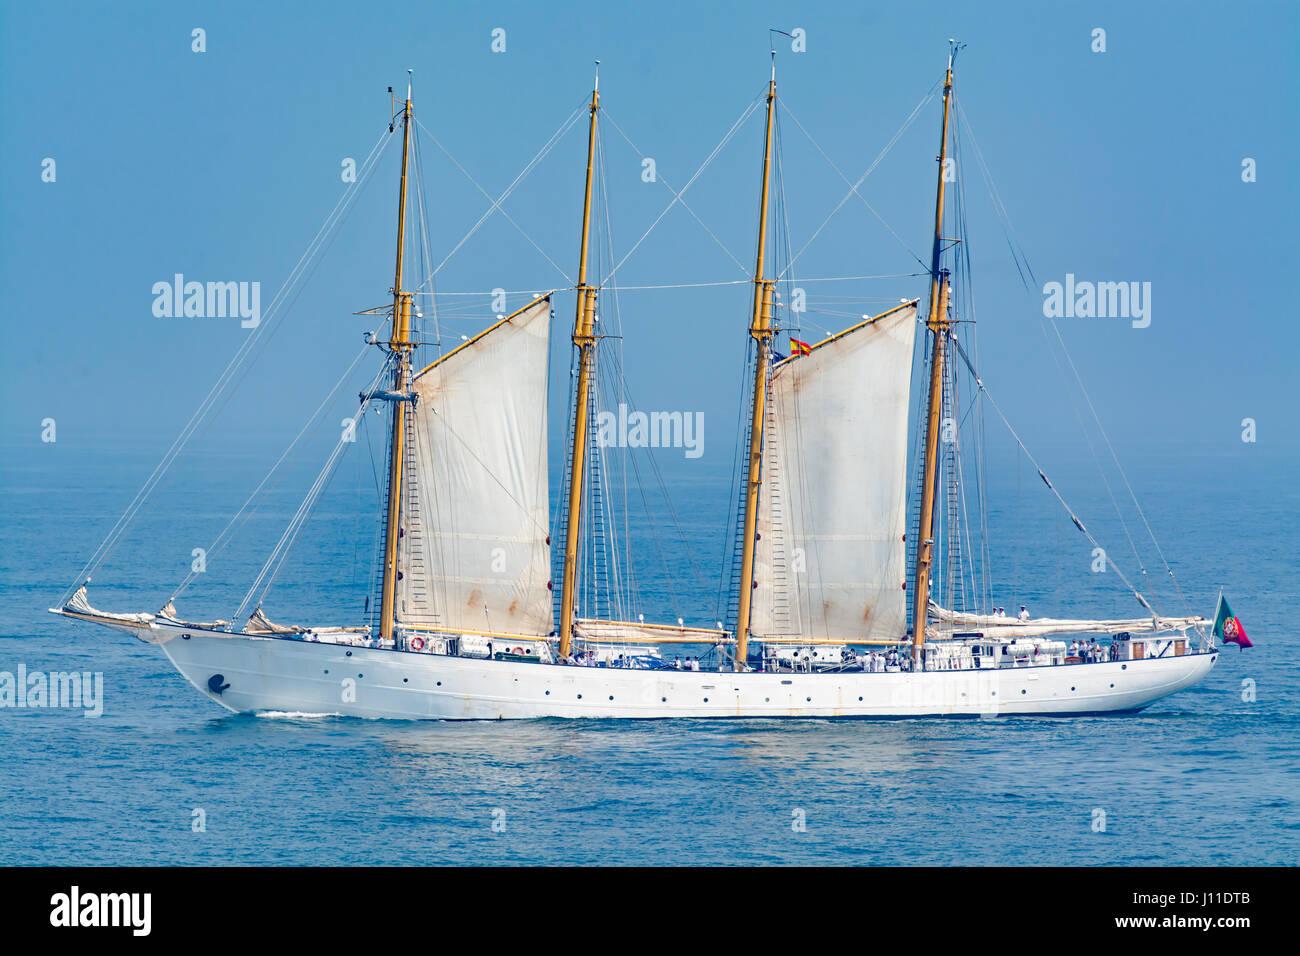 Tall Ship Segeln auf offener Ozean gegen blauen Himmel Stockbild